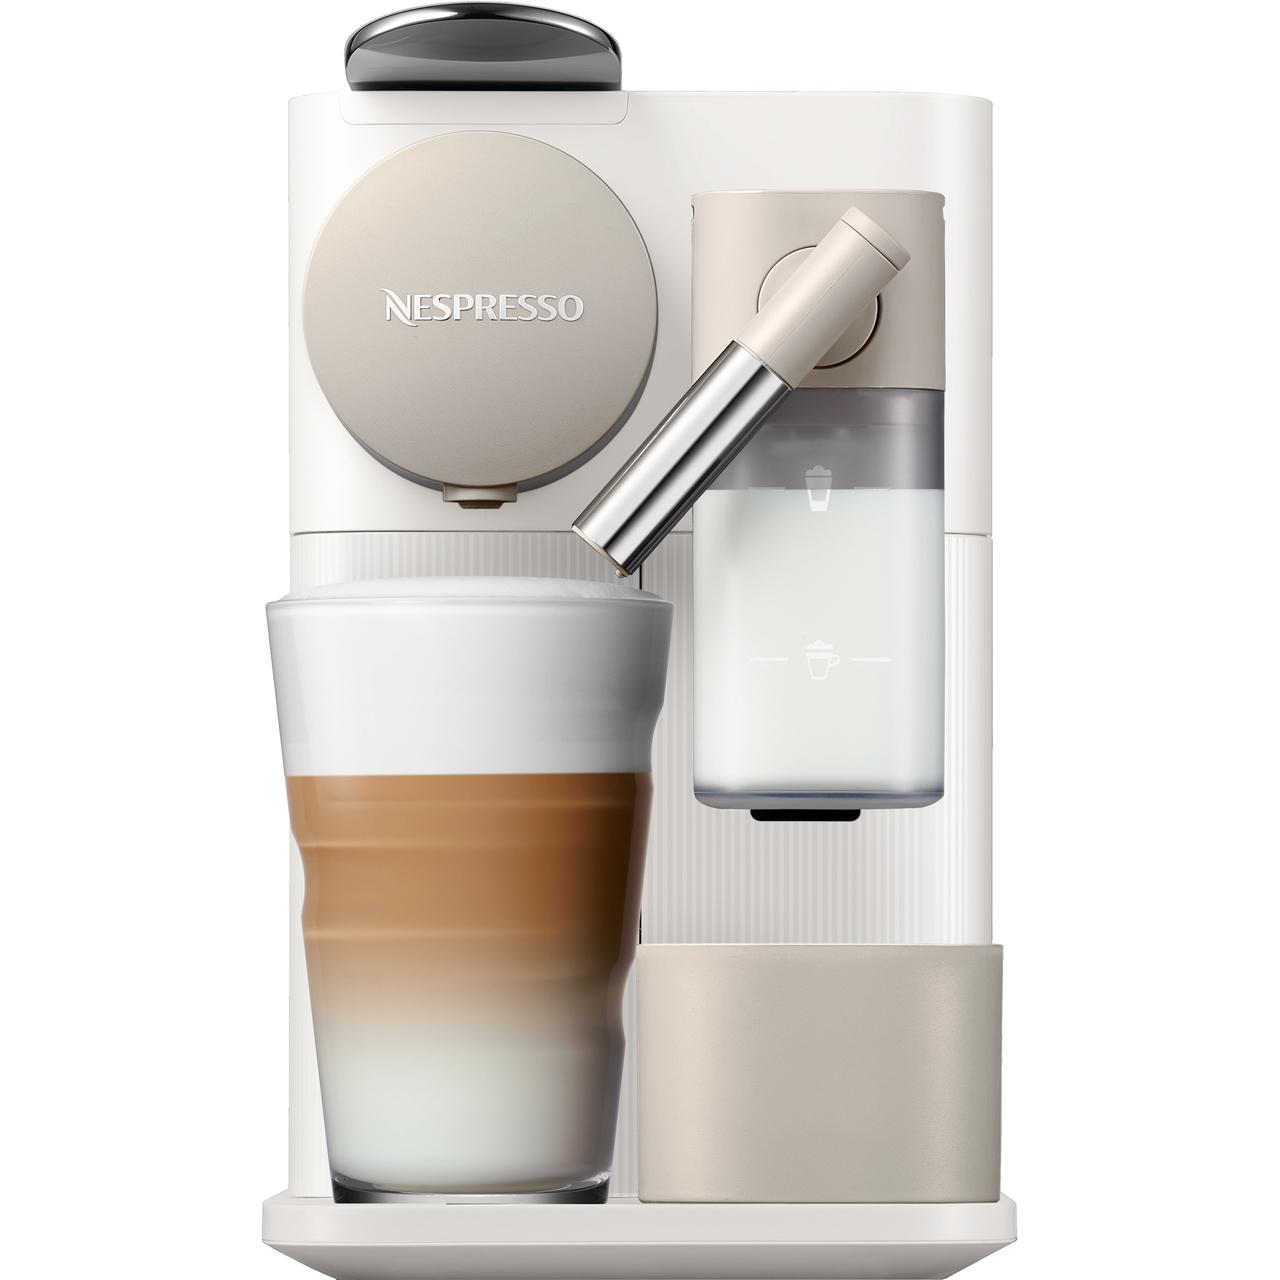 Nespresso Lattissima One Coffee Machine with 150 Free Nespresso Capsules & Travel Mug (via redemption) £109 Delivered @ ao